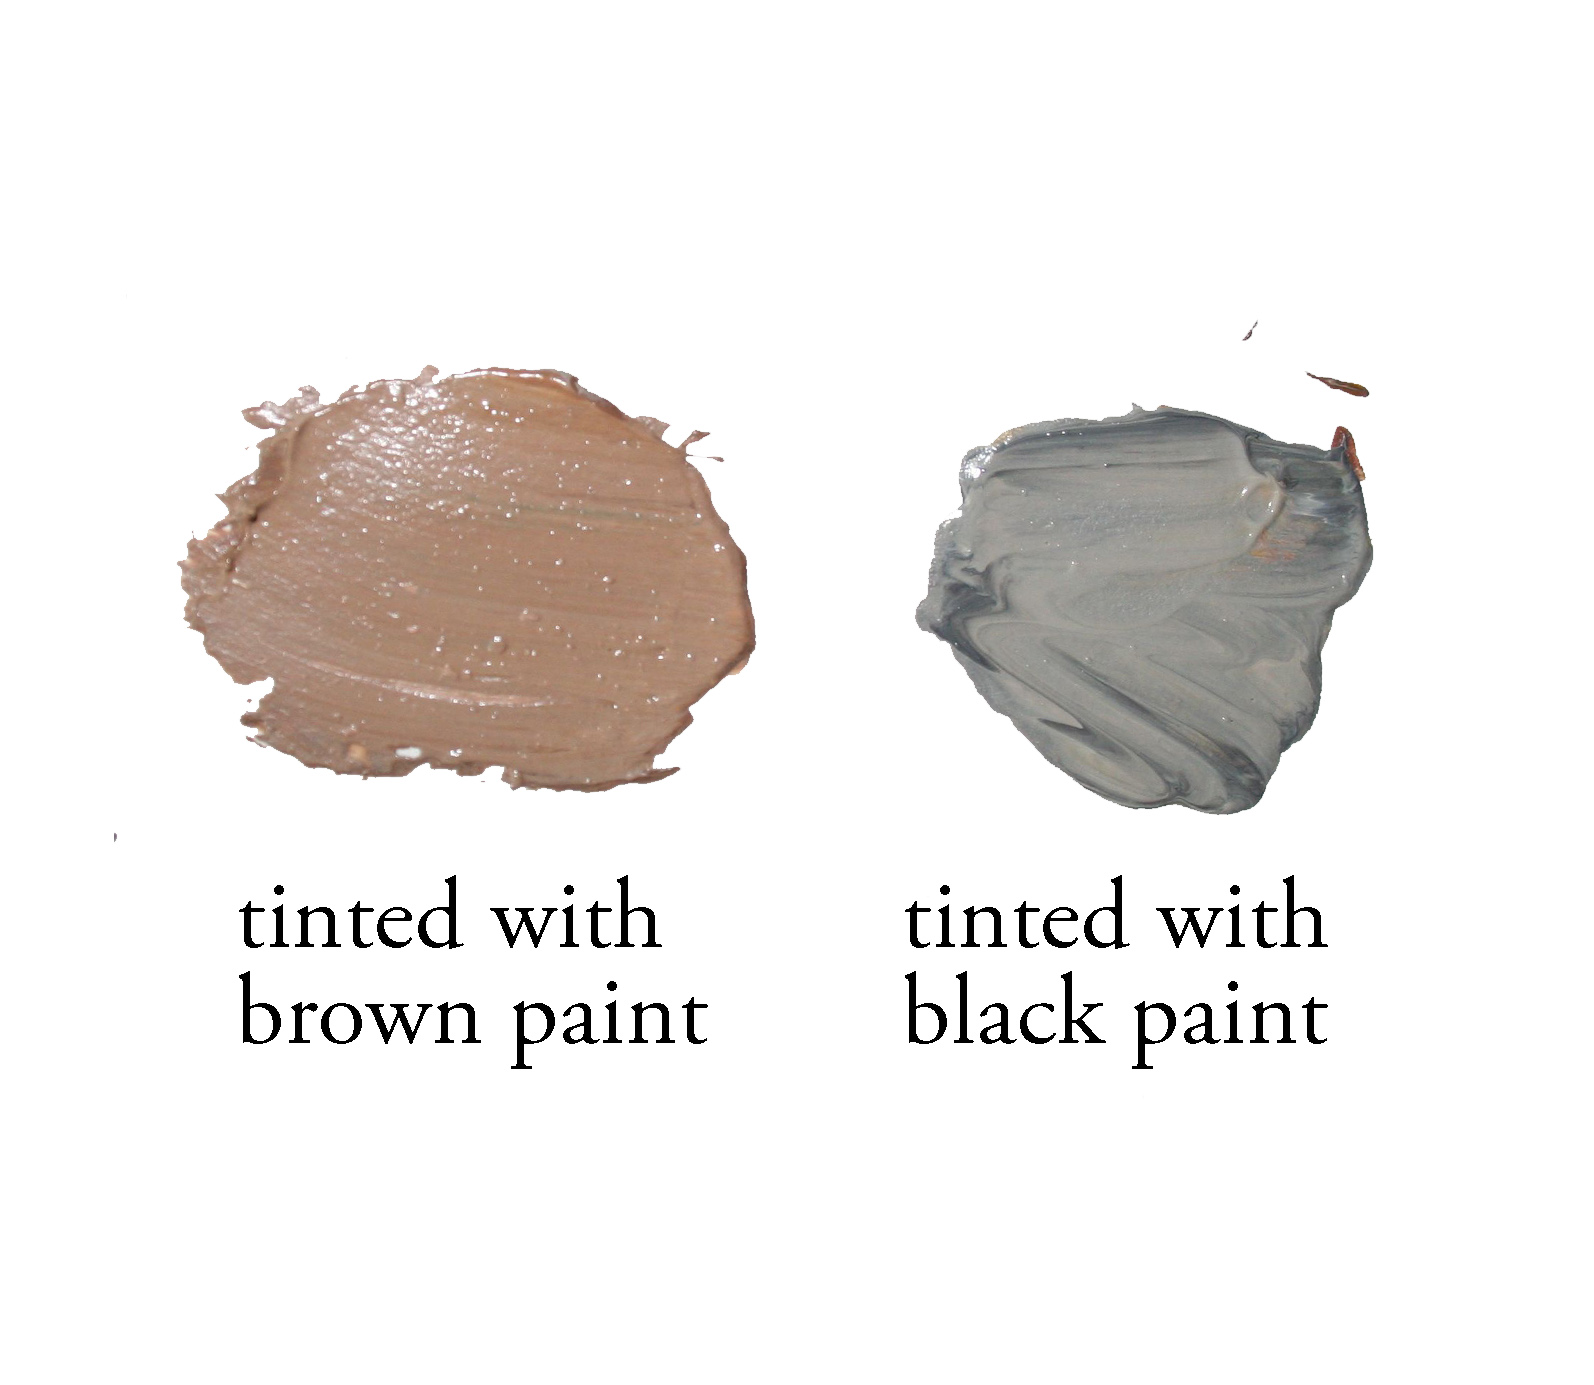 Black versus brown paint to tint